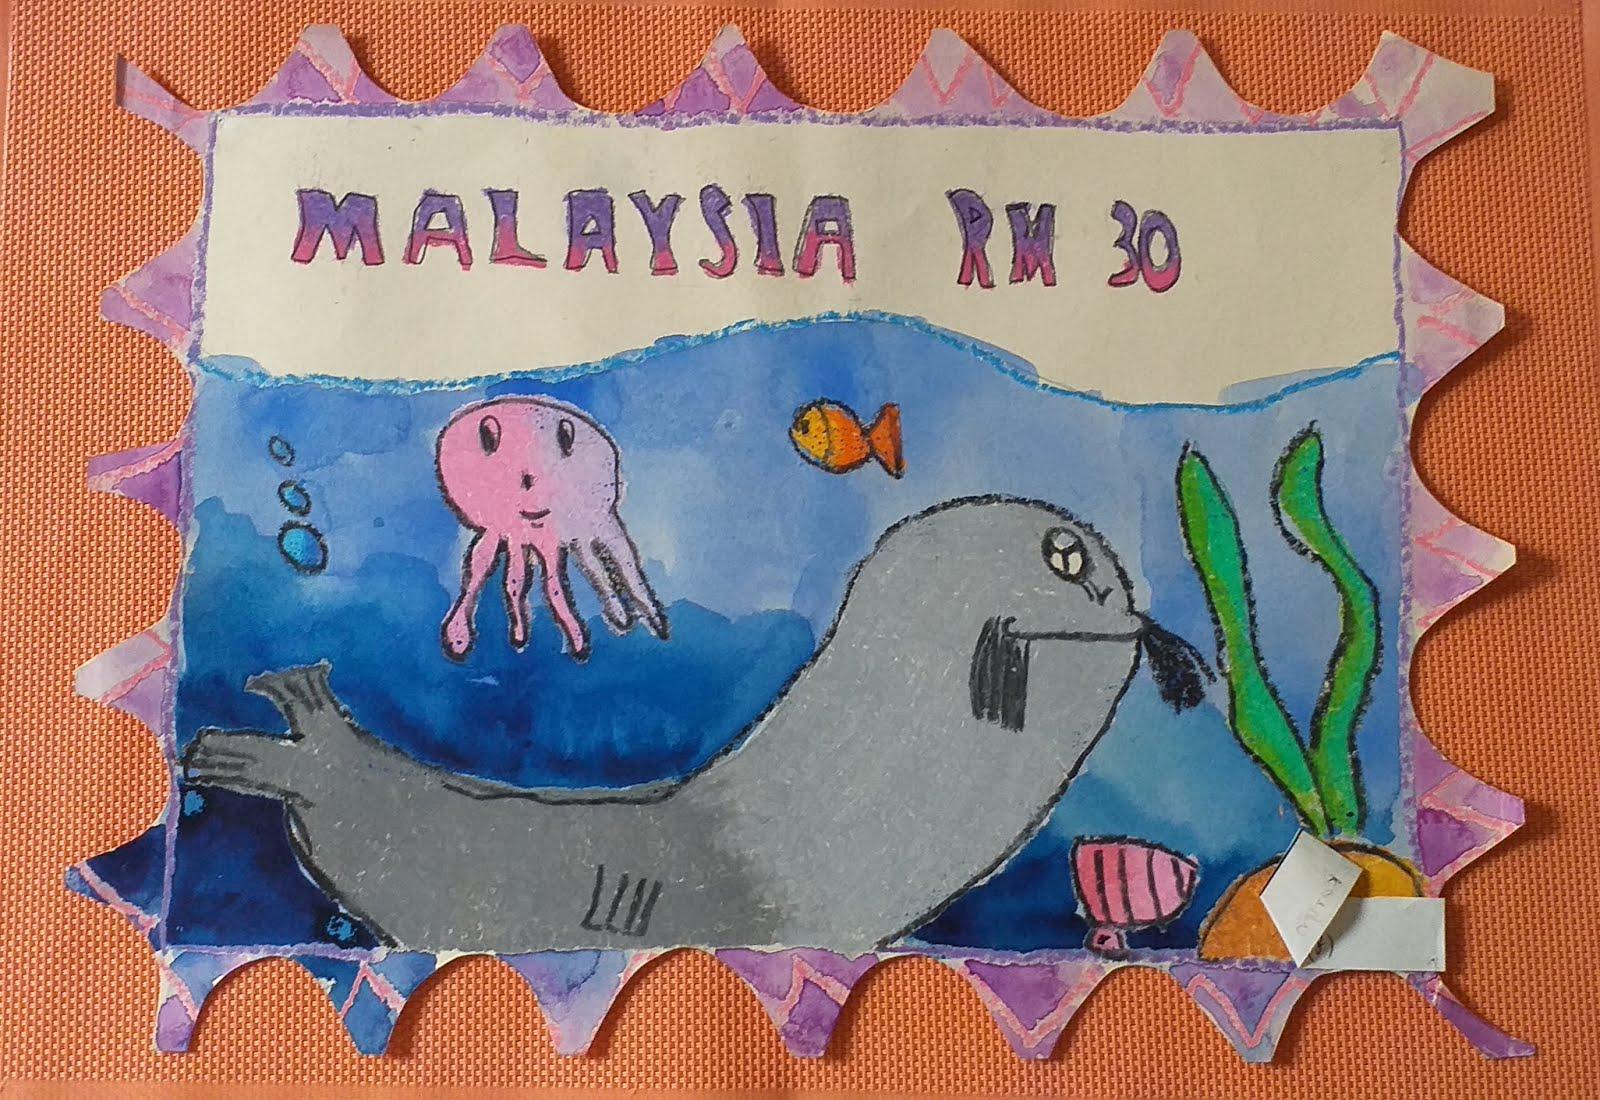 Ringgit Malaysia 30 stamp